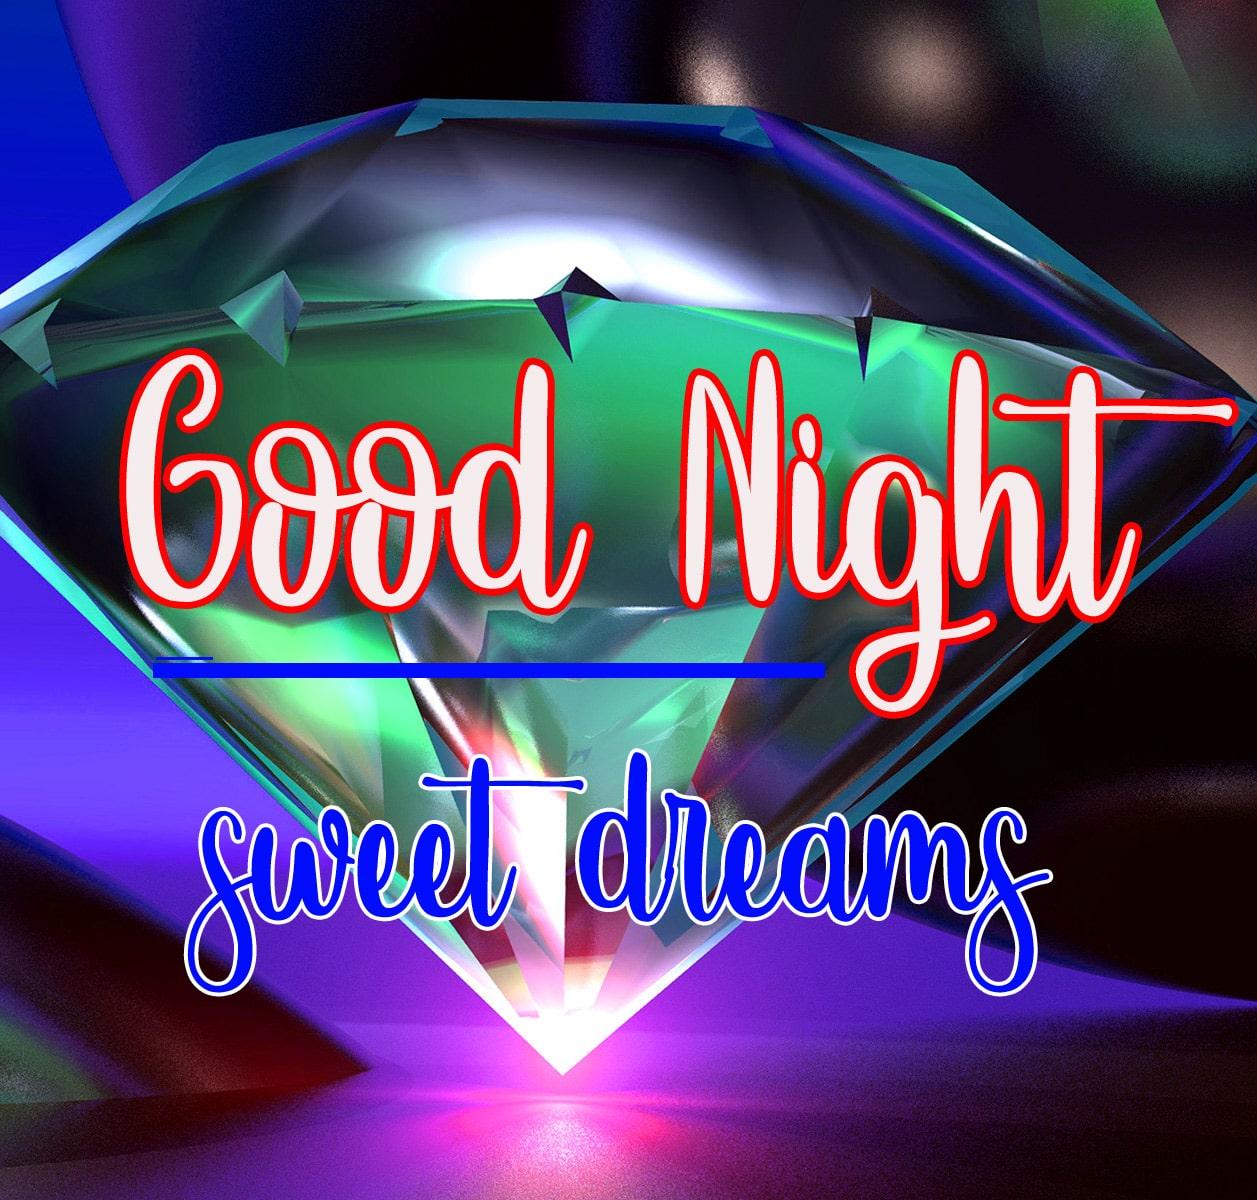 Good Night photo 13